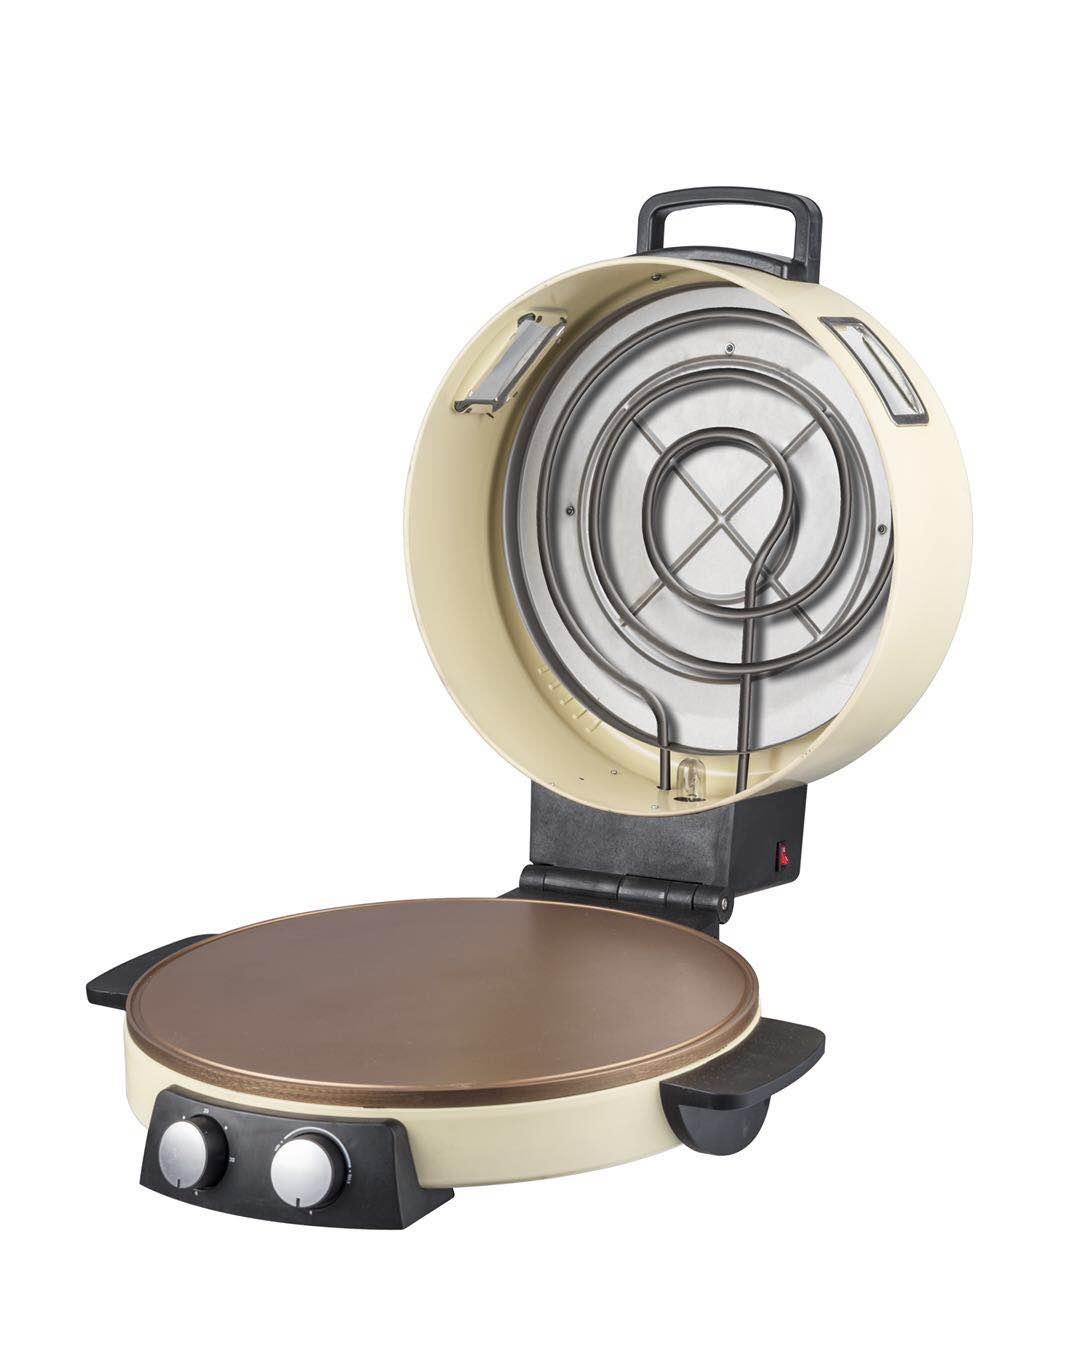 16 inch (40 cm diameter) arabic bread maker (new item)